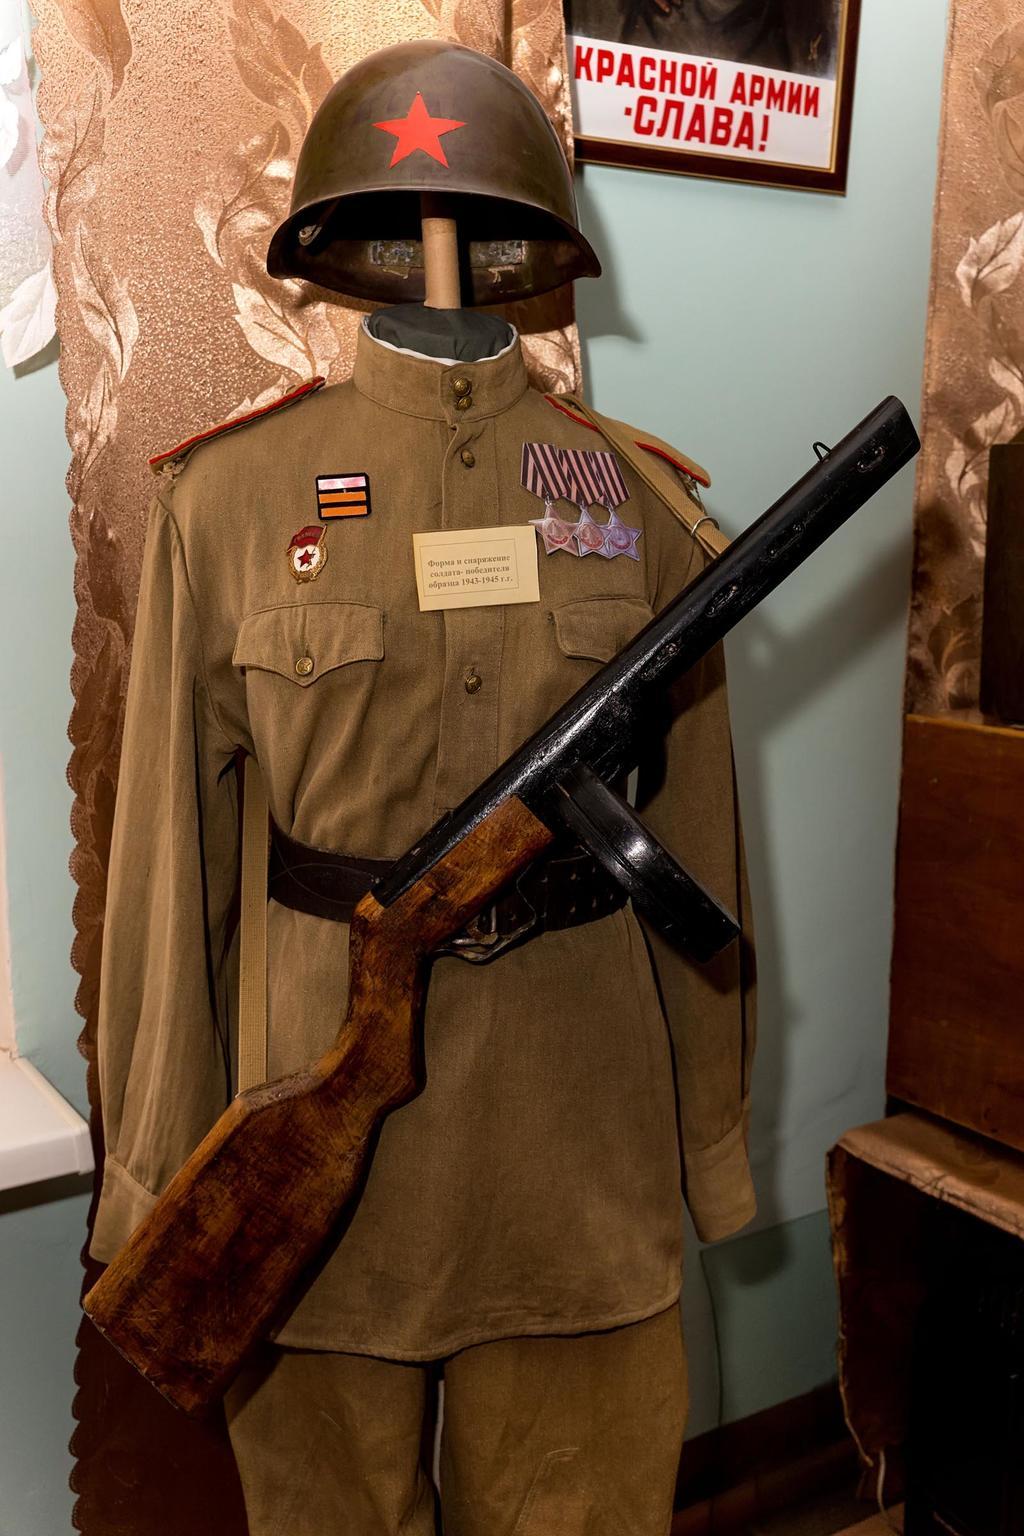 Форма и снаряжение солдата – победителя образца 1943-1945 гг. Ткань, кожа, металл ©Tatfrontu.ru Photo Archive